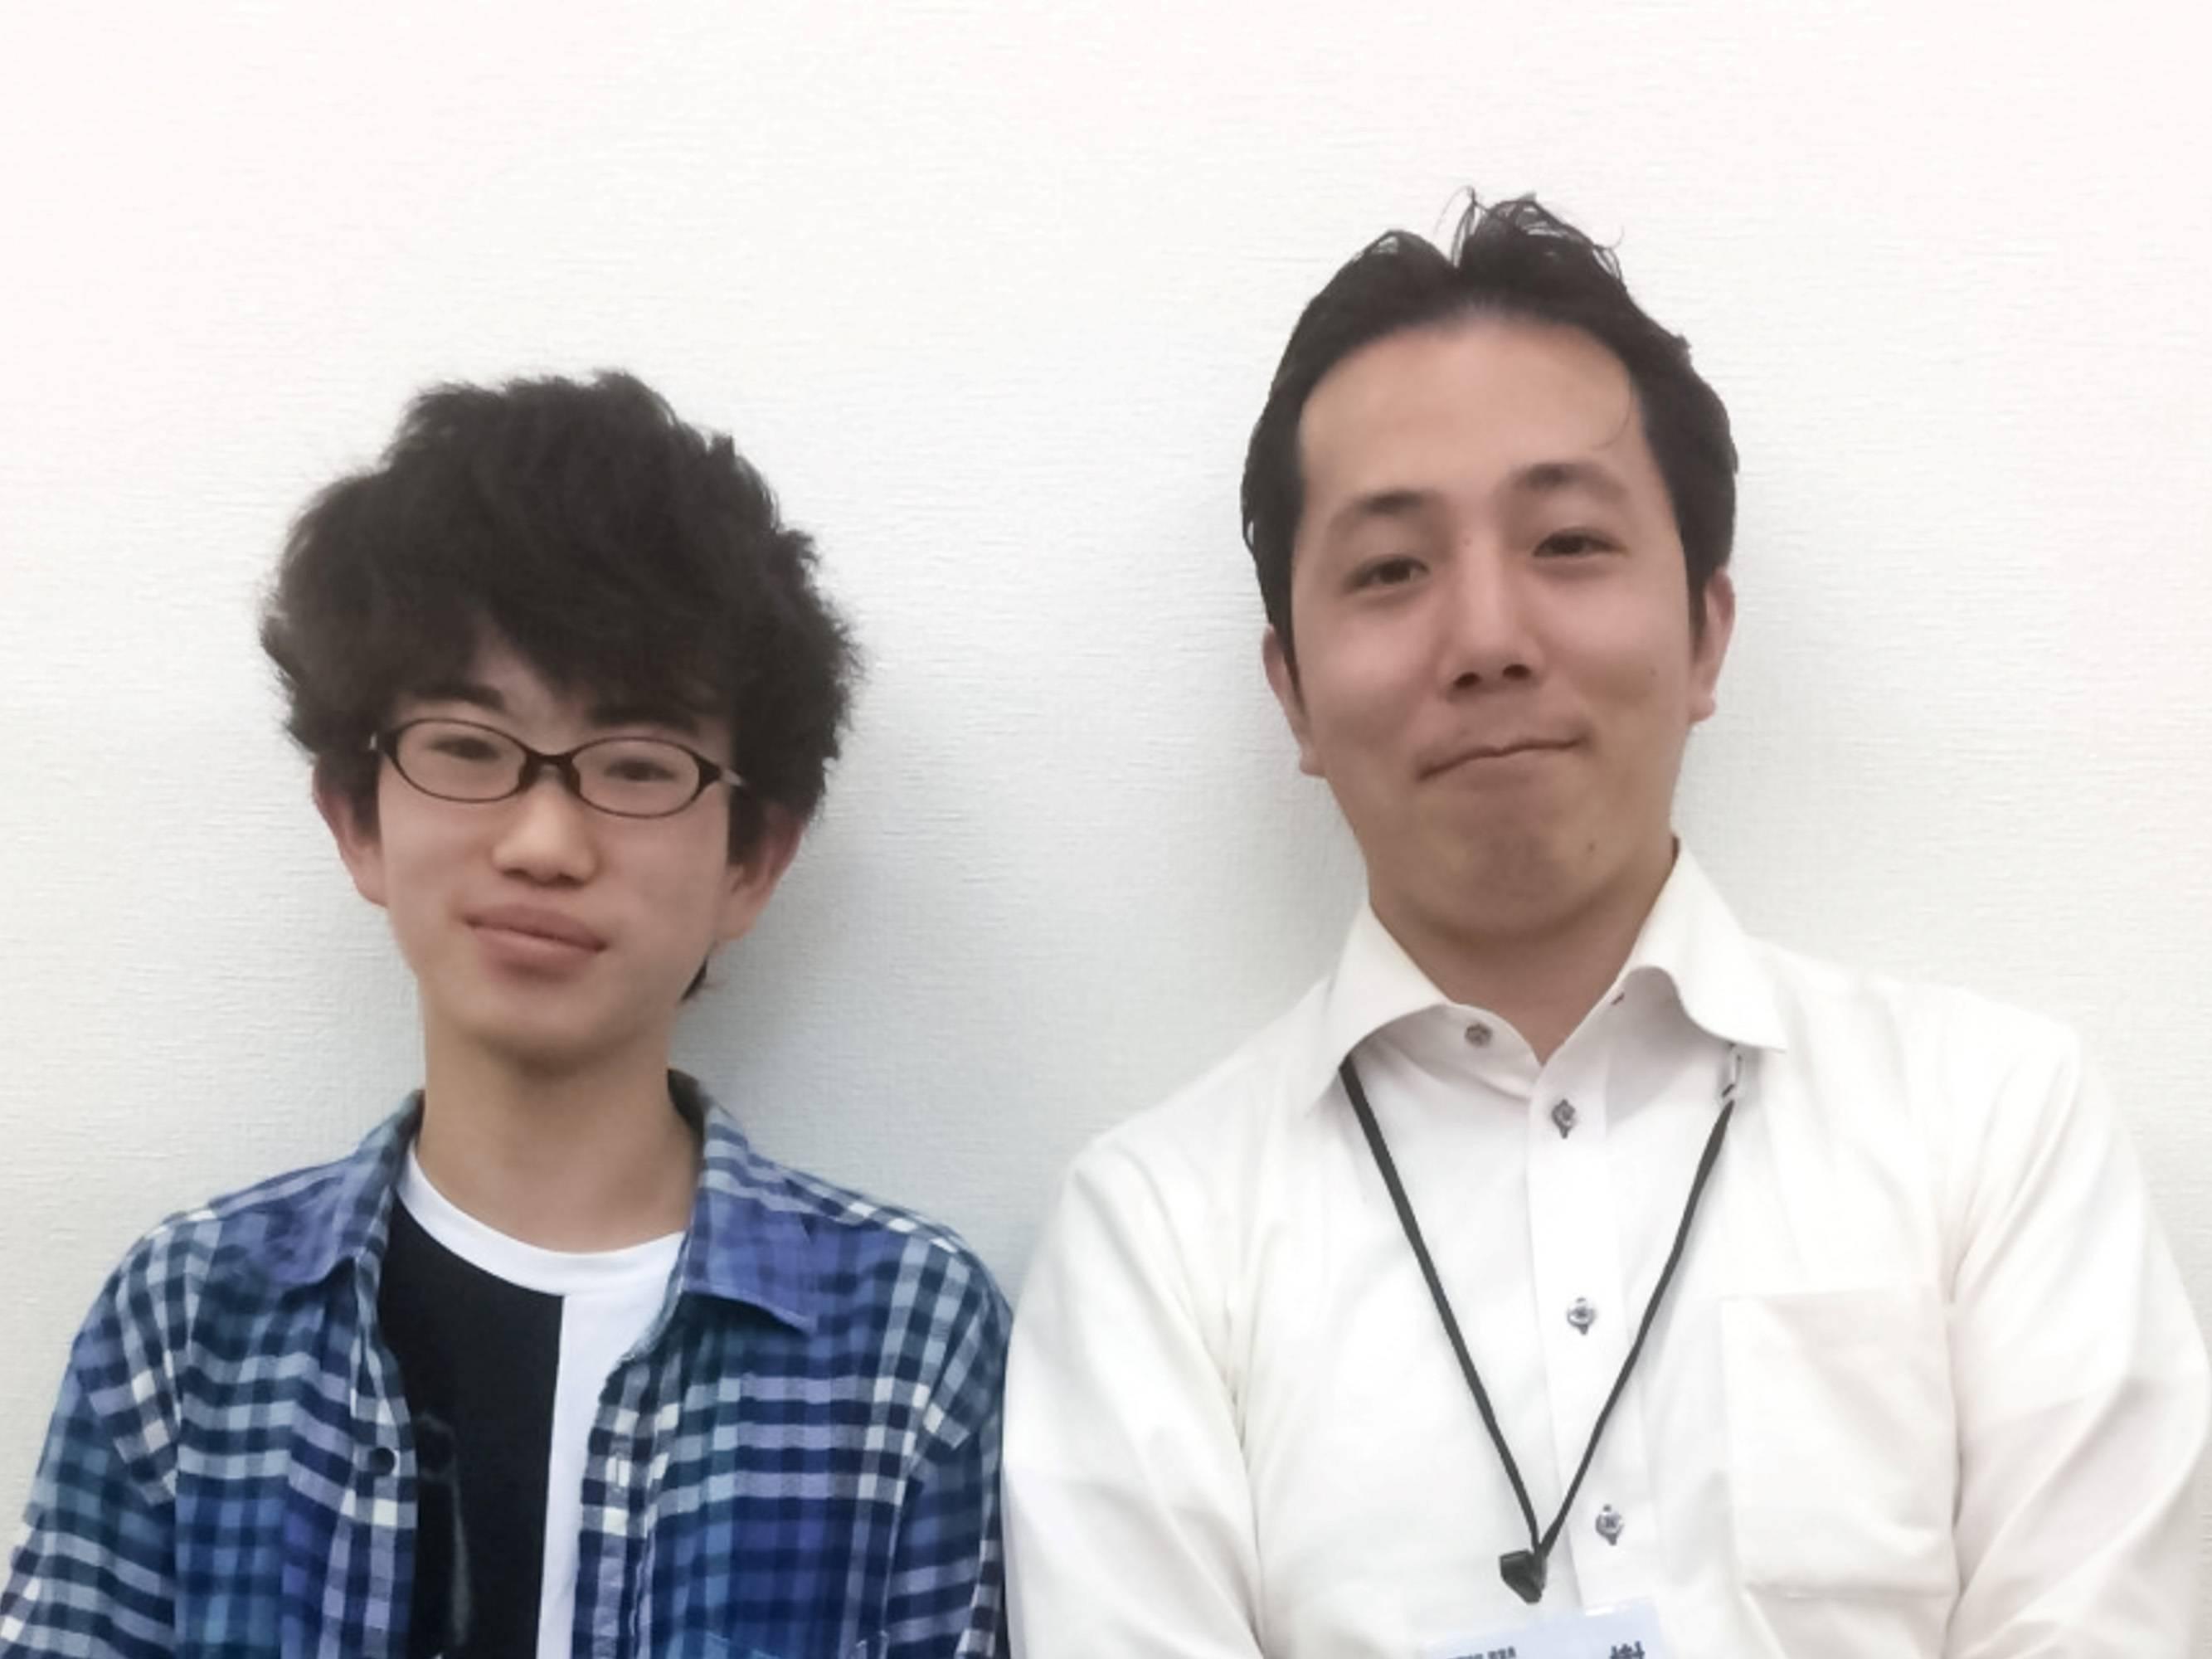 H29夏 中学2年 髙城春樹くん 浜田先生